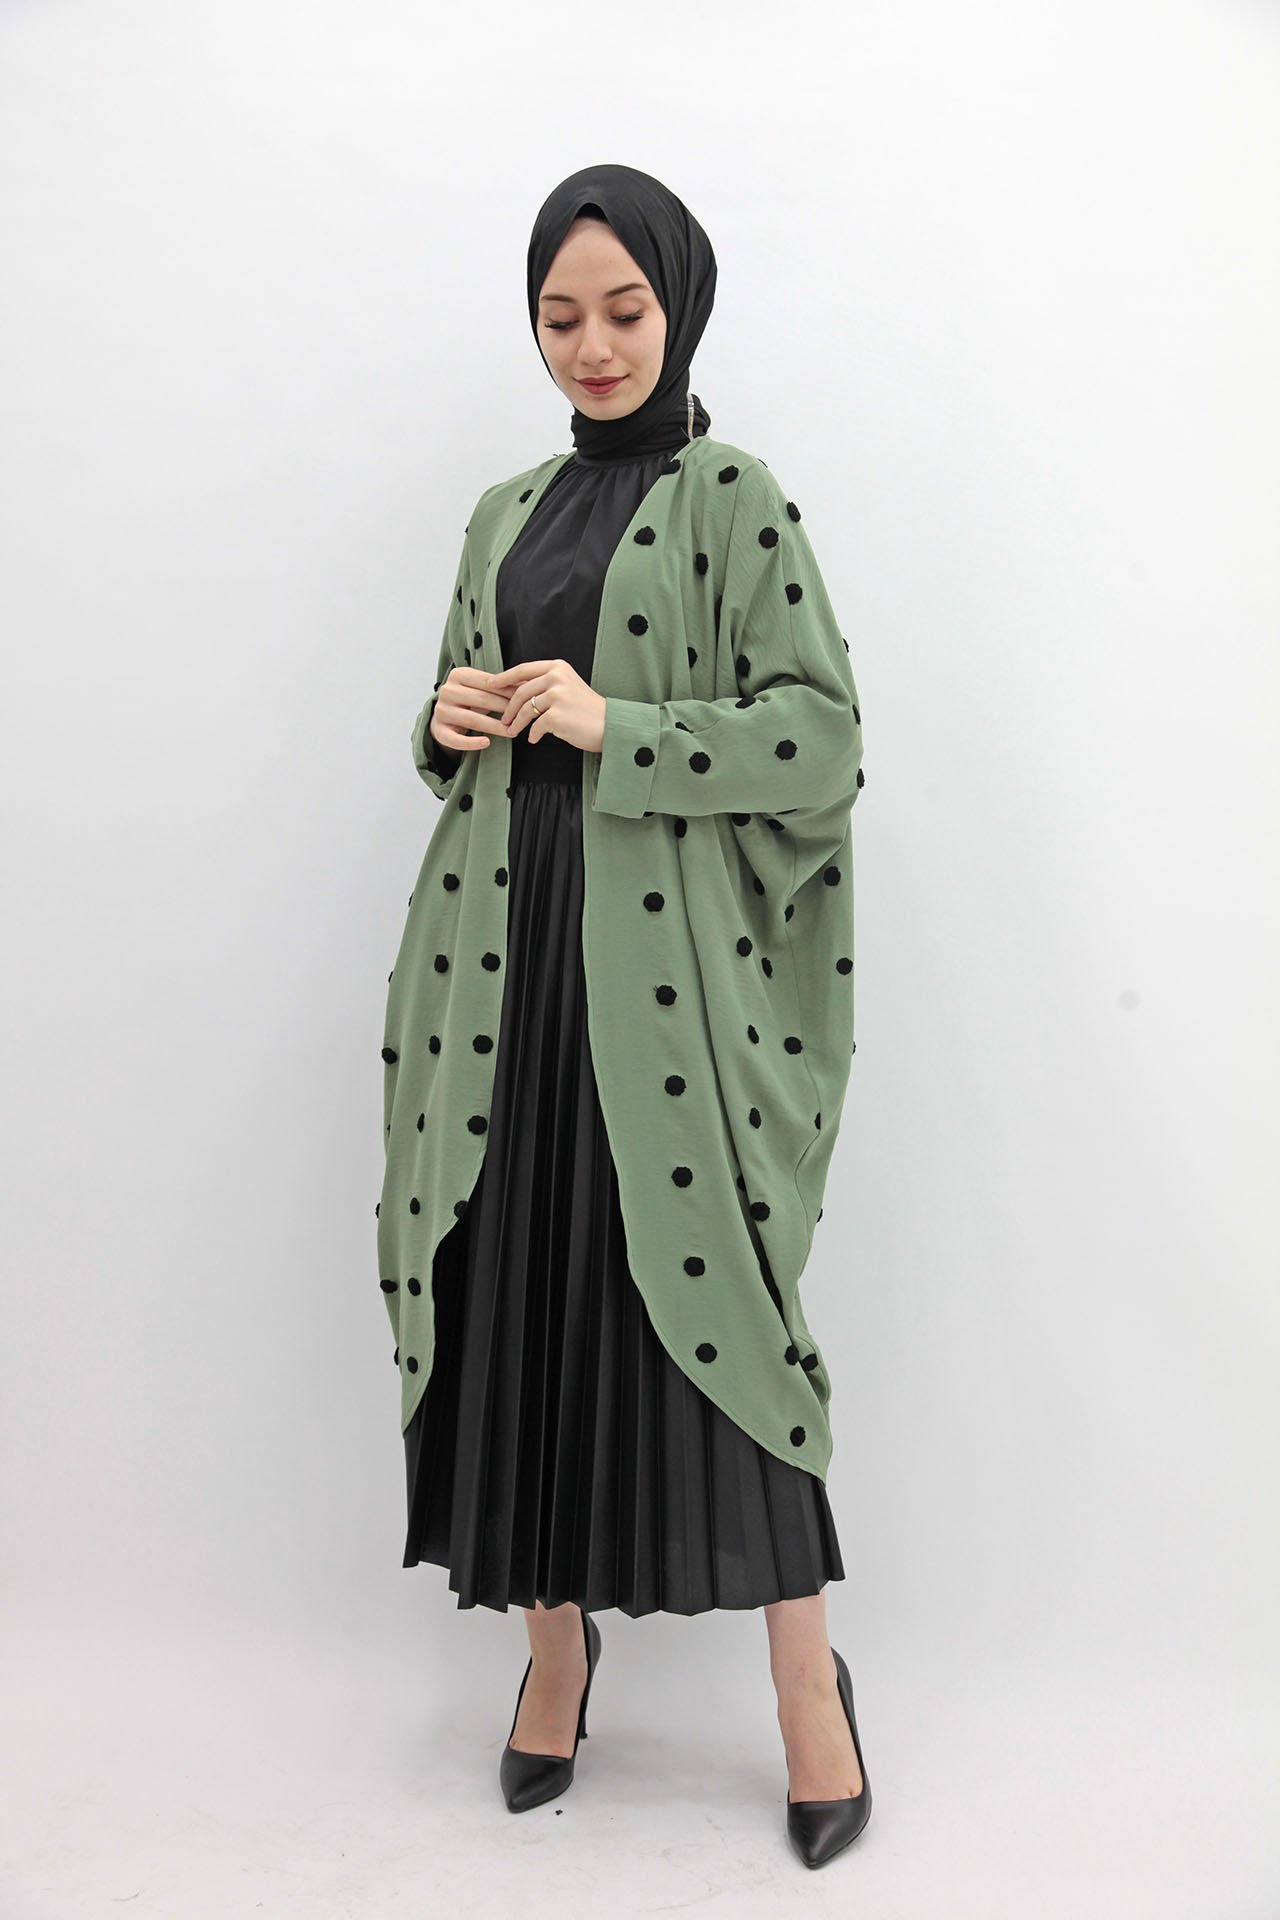 GİZAGİYİM - Puantiyeli Kimono Yeşil